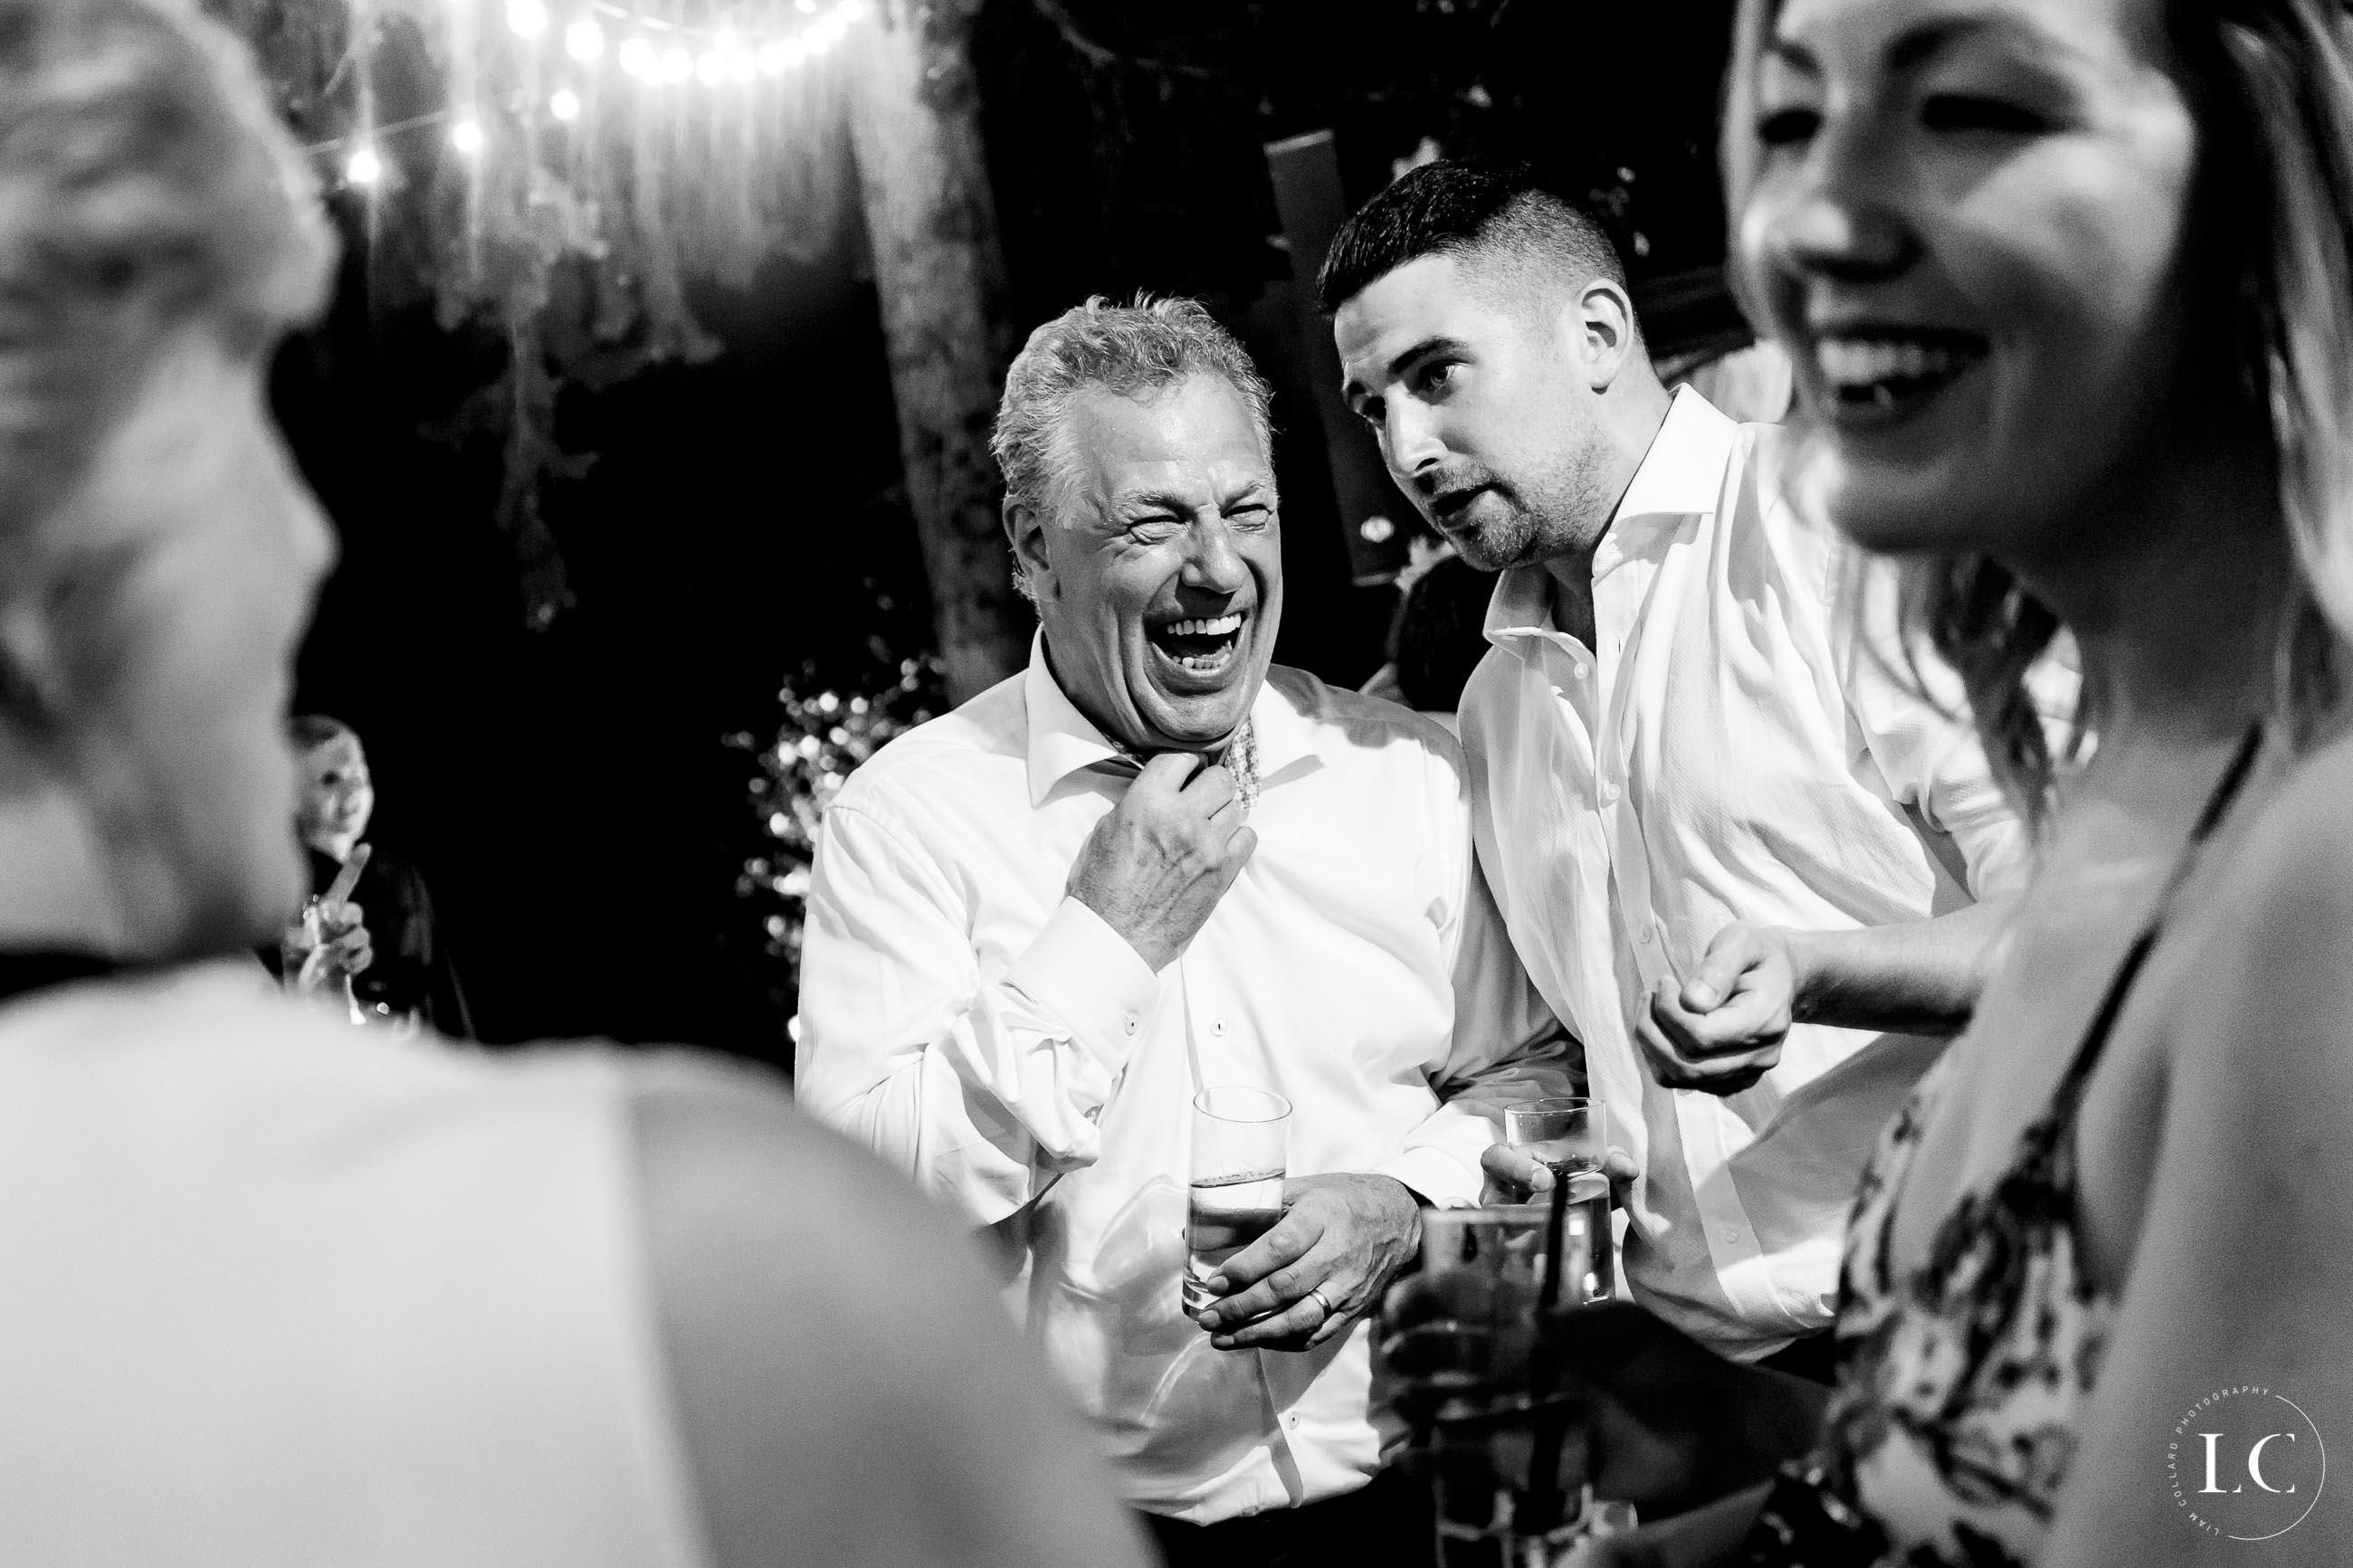 Men talking and laughing